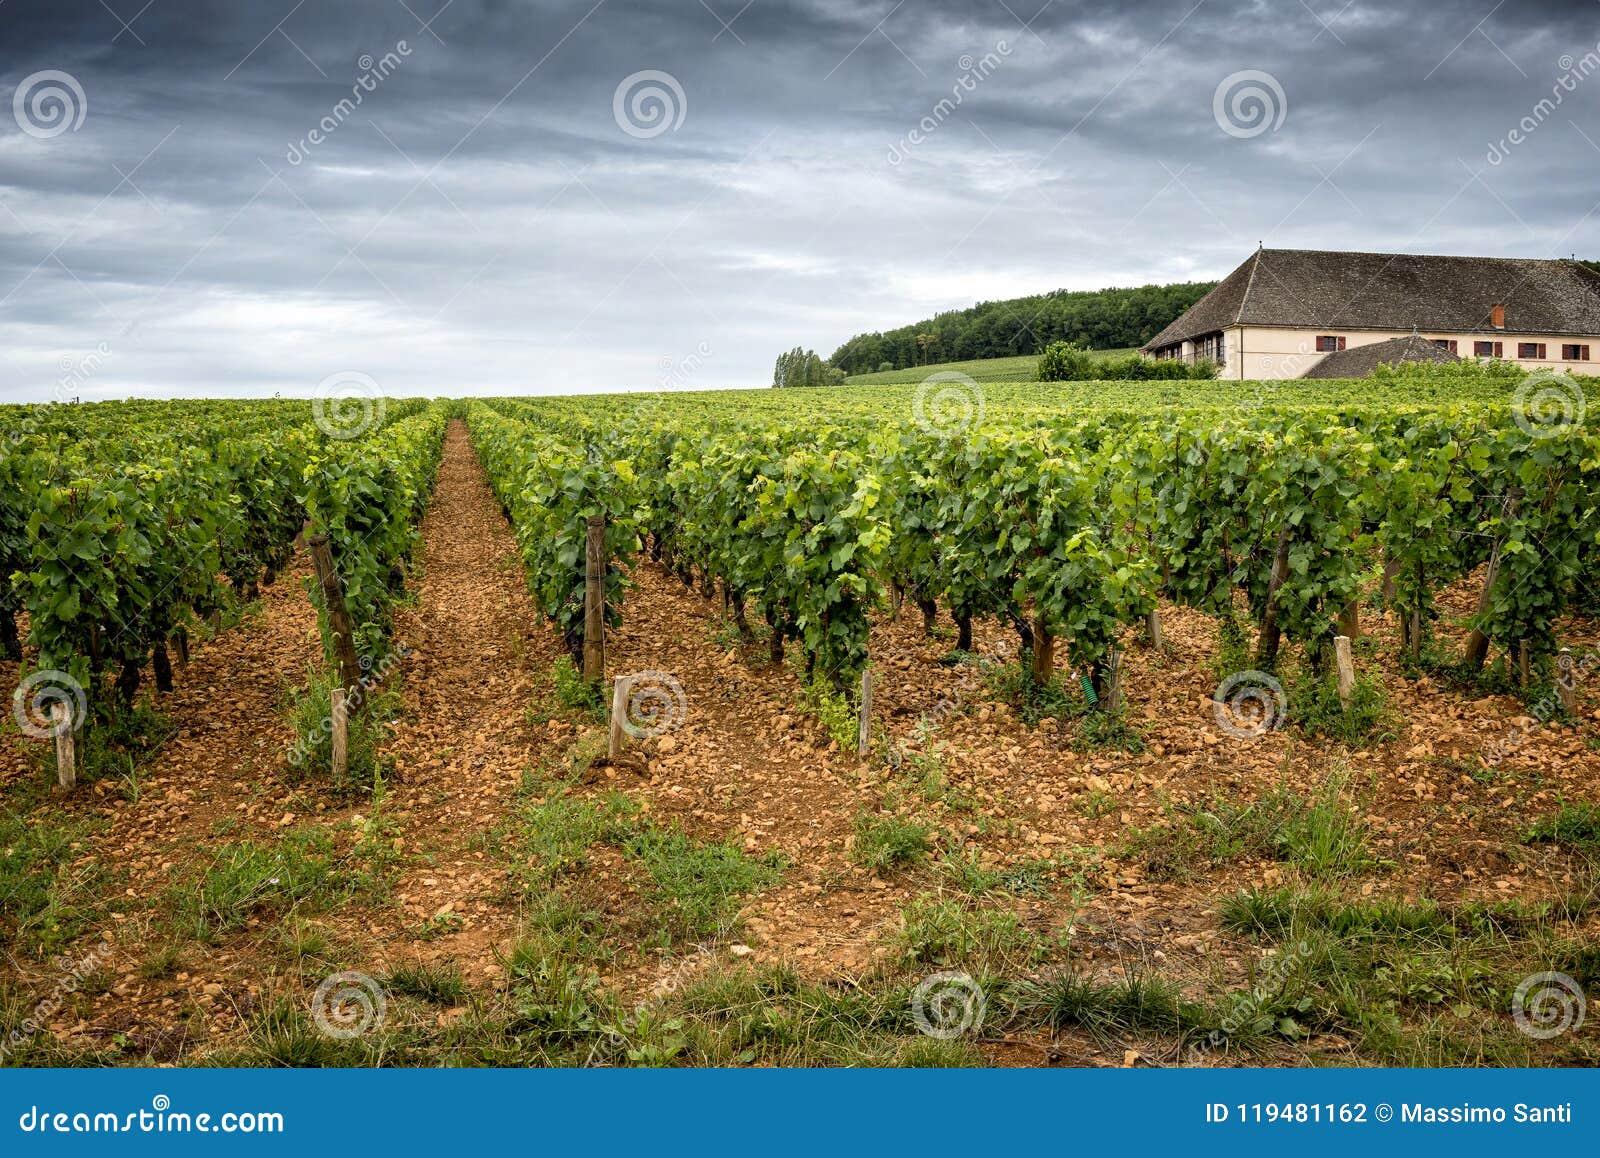 Burgundy, πολύ κάστρο πύργων περιβάλλεται από πολλά στρέμματα των αμπελώνων και είναι μεγάλοι παραγωγοί κρασιού Γαλλία